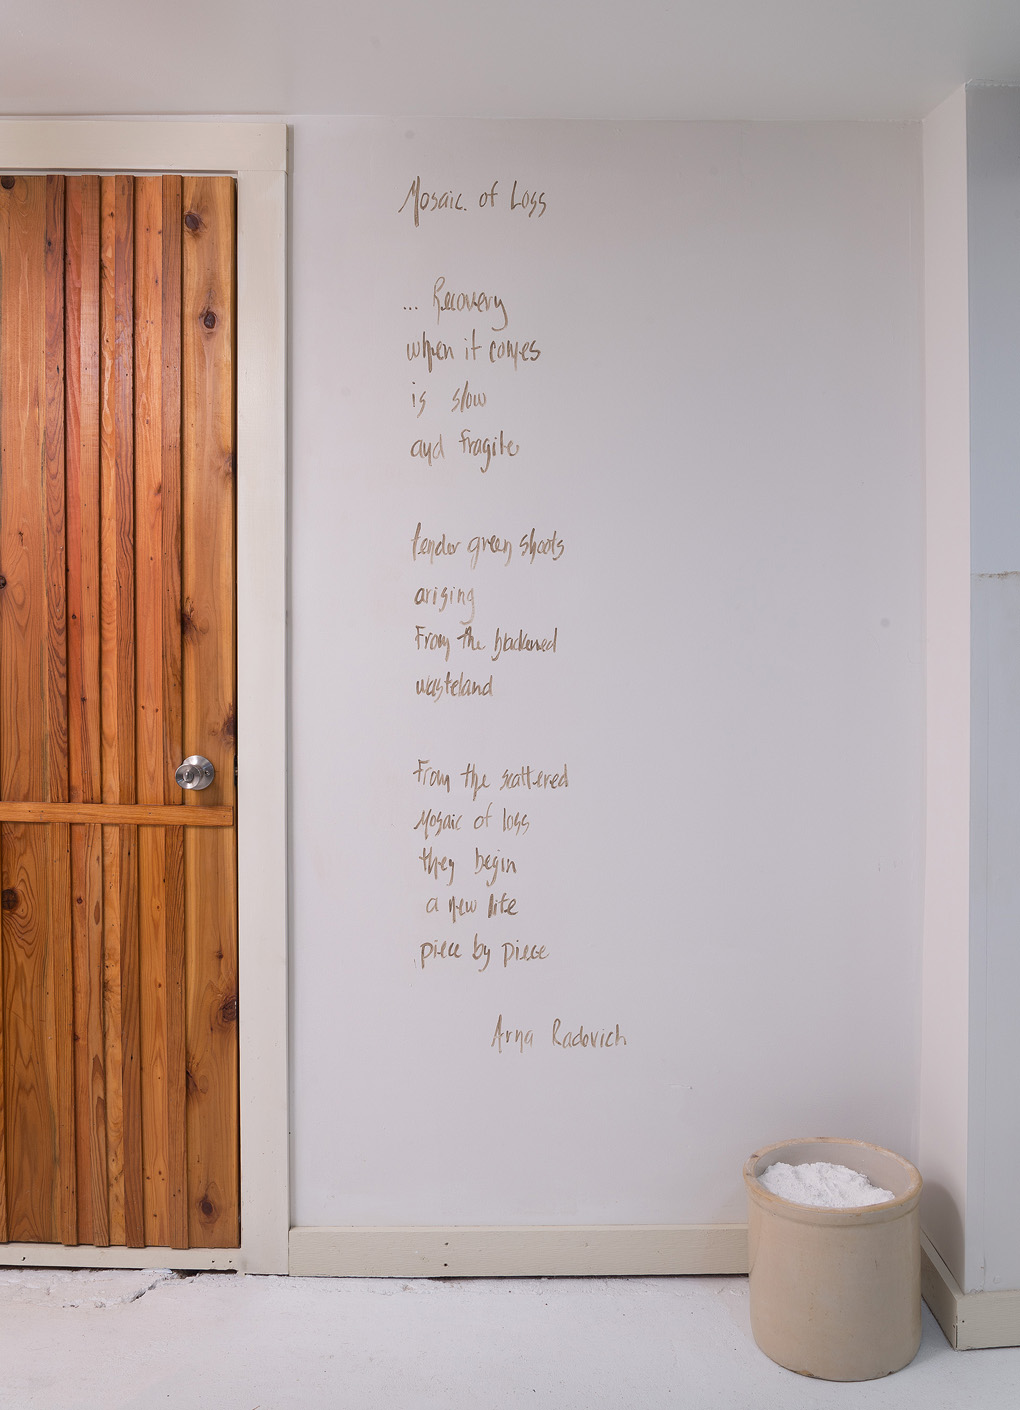 Installation detail of Arna Radovich poem written in Kansas mud.